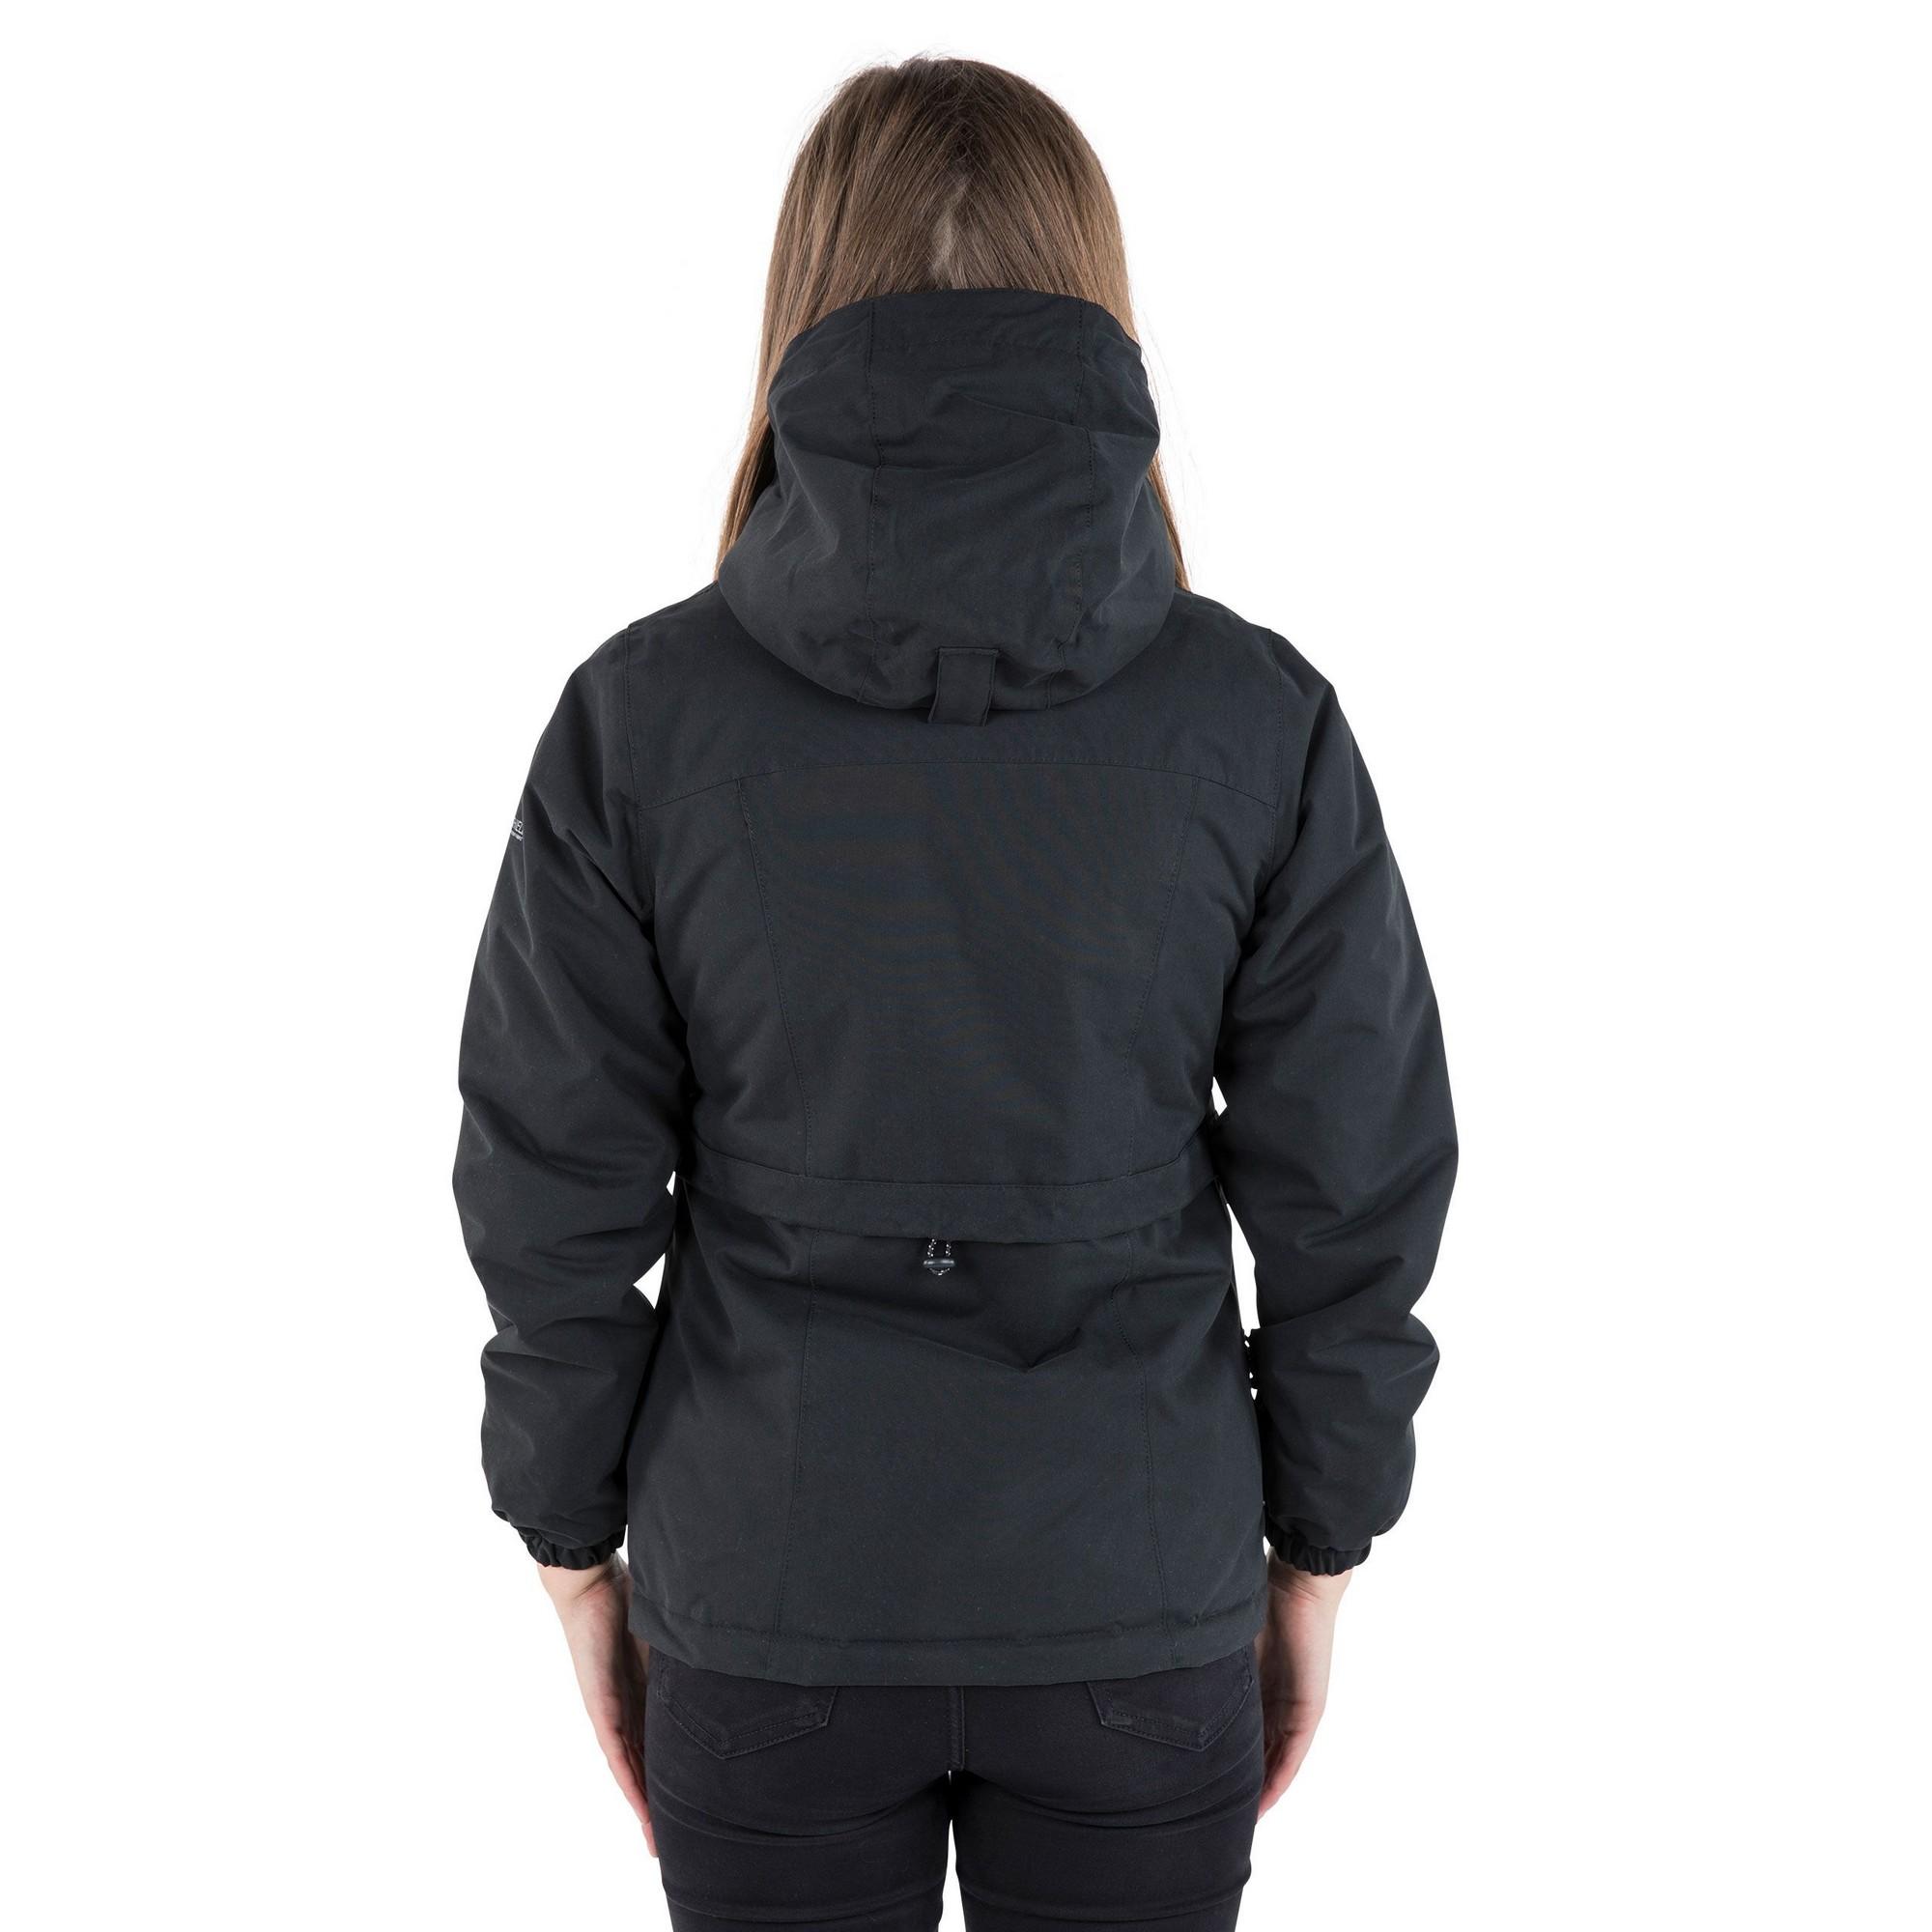 pour tp4191 femme Trespass Jacket femme Liberate Ex6wUwqBHC